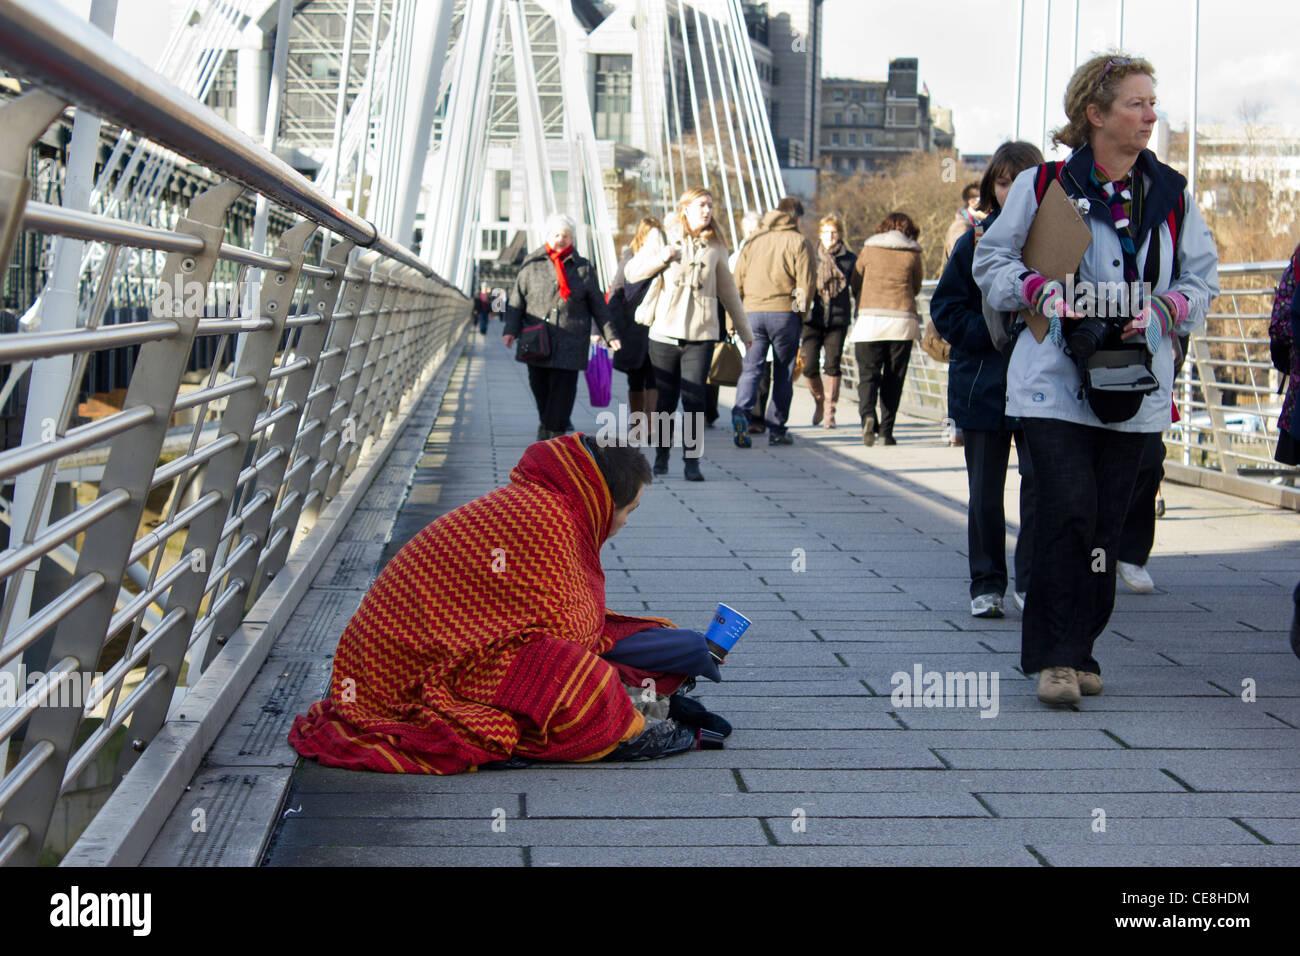 man wrapped in blanket begging on Golden Jubilee Bridge, London, UK - Stock Image